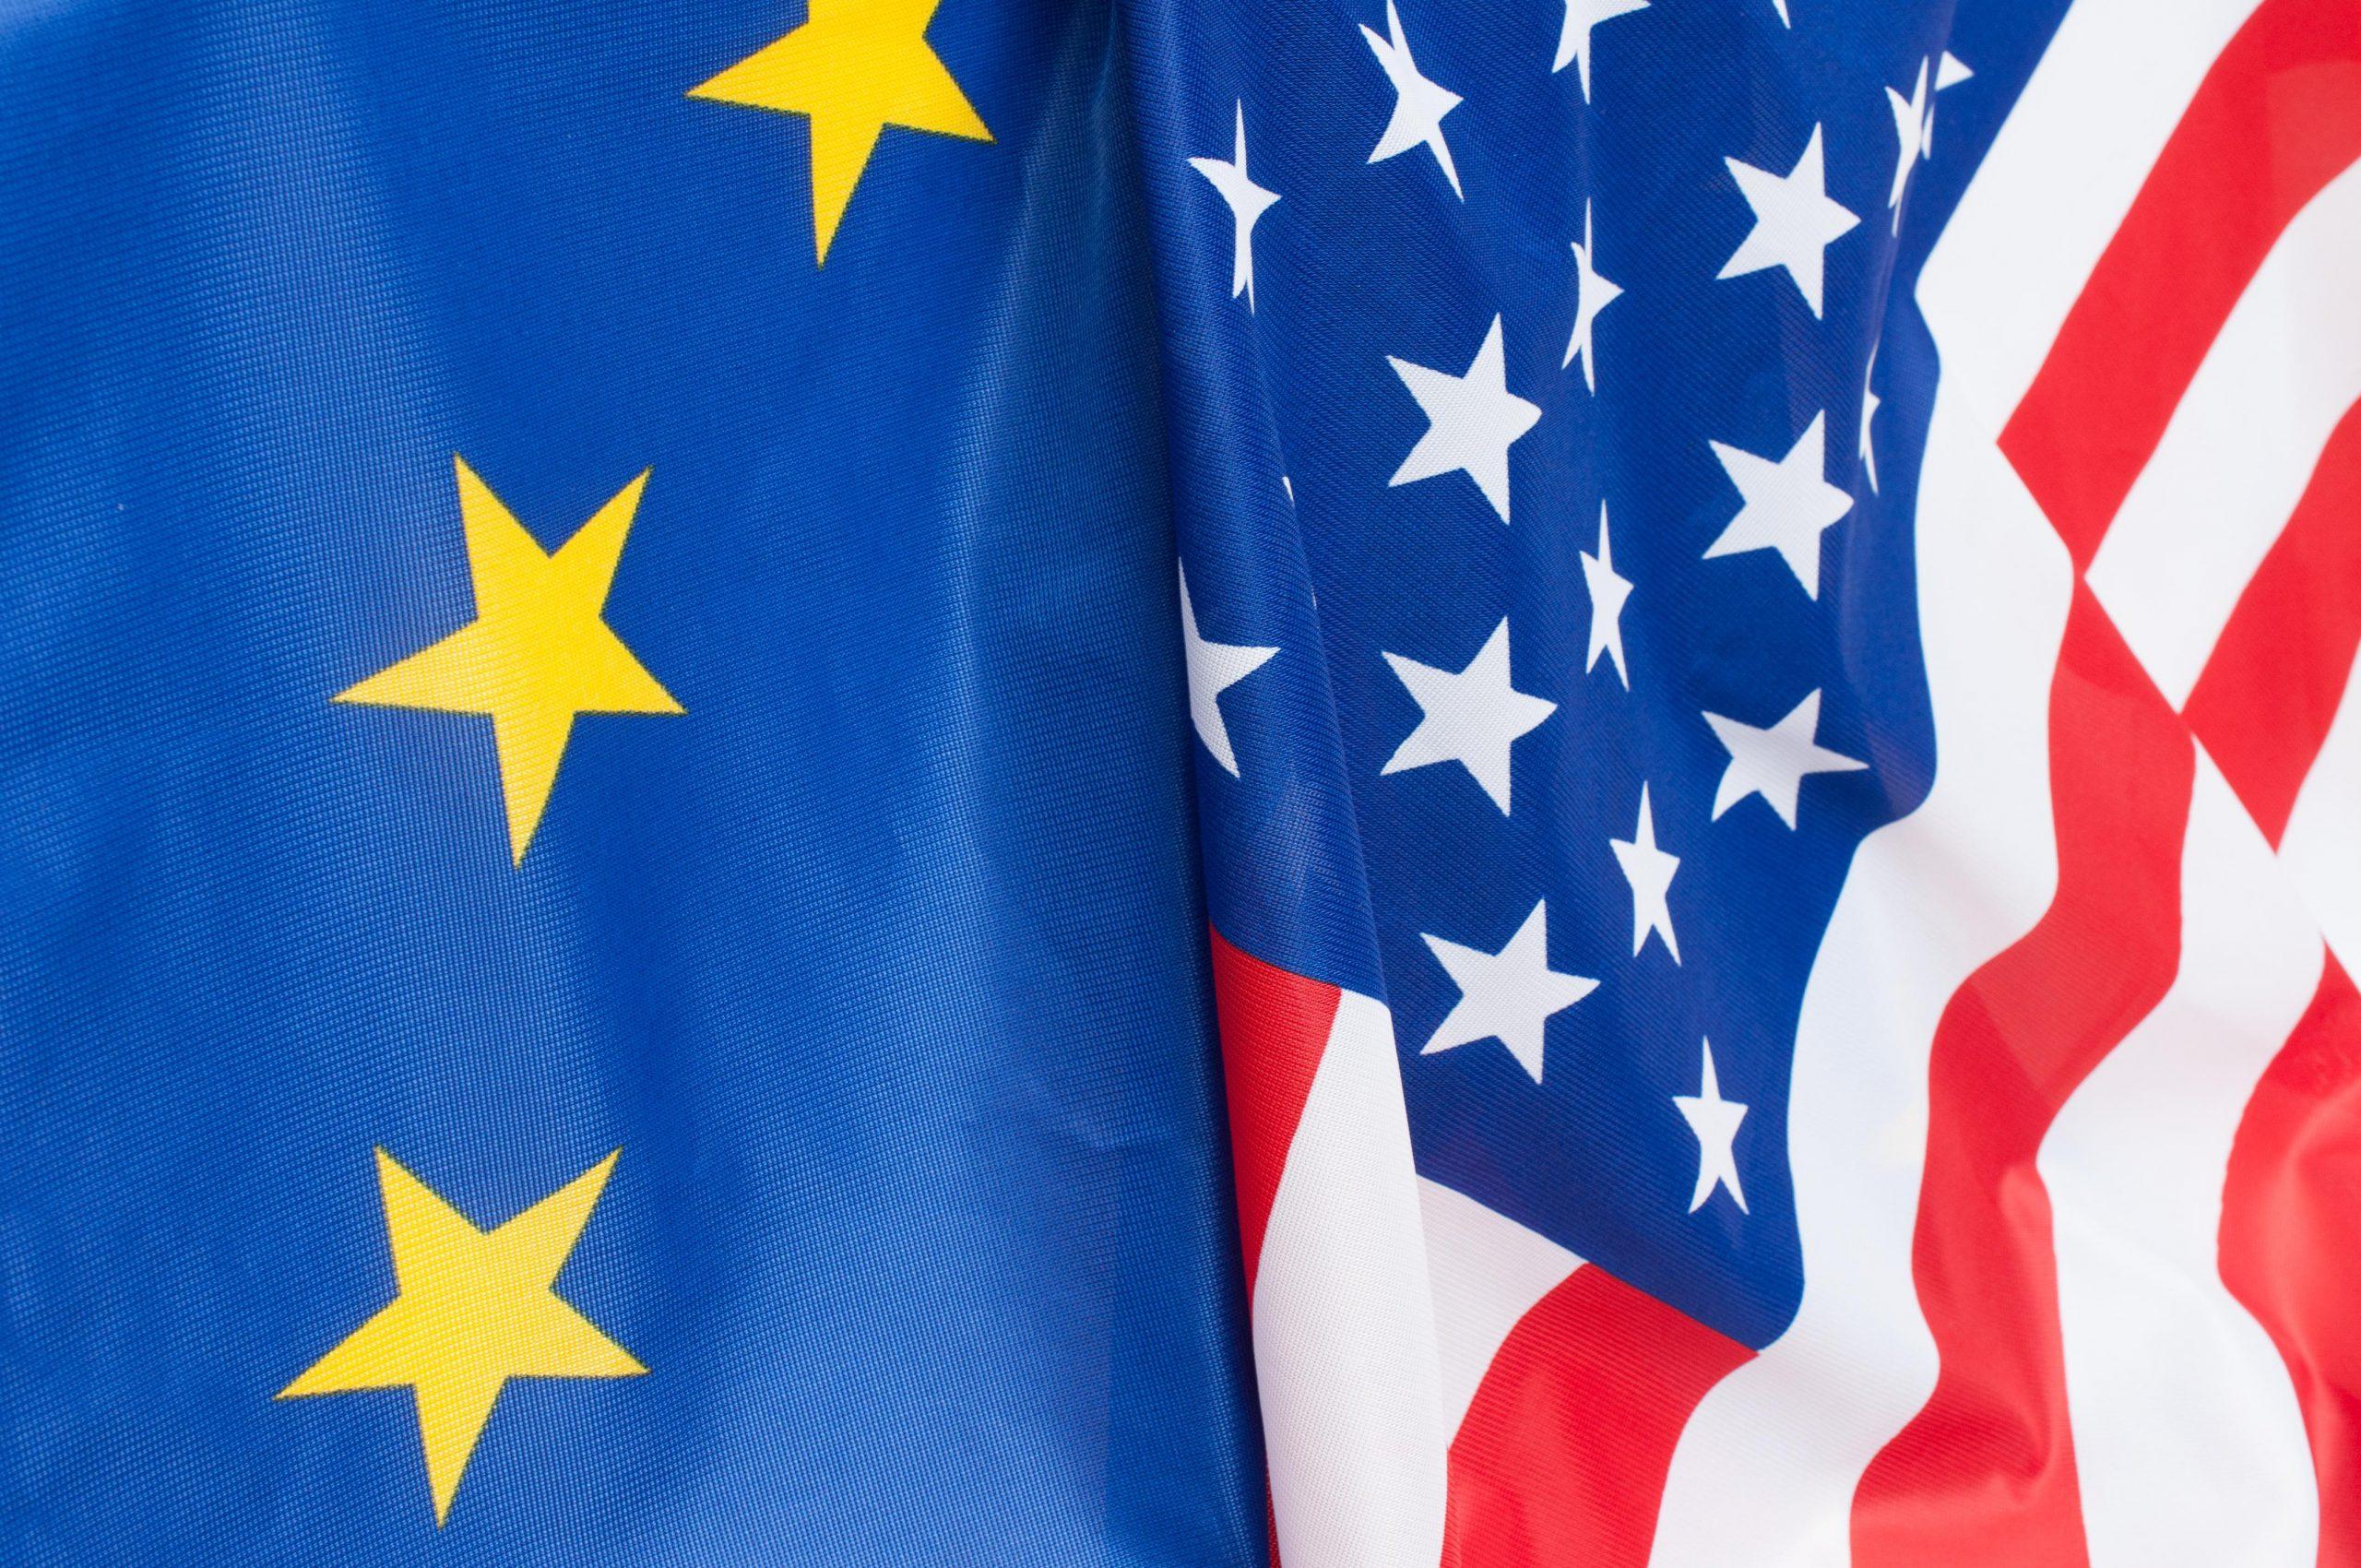 EU_US flags